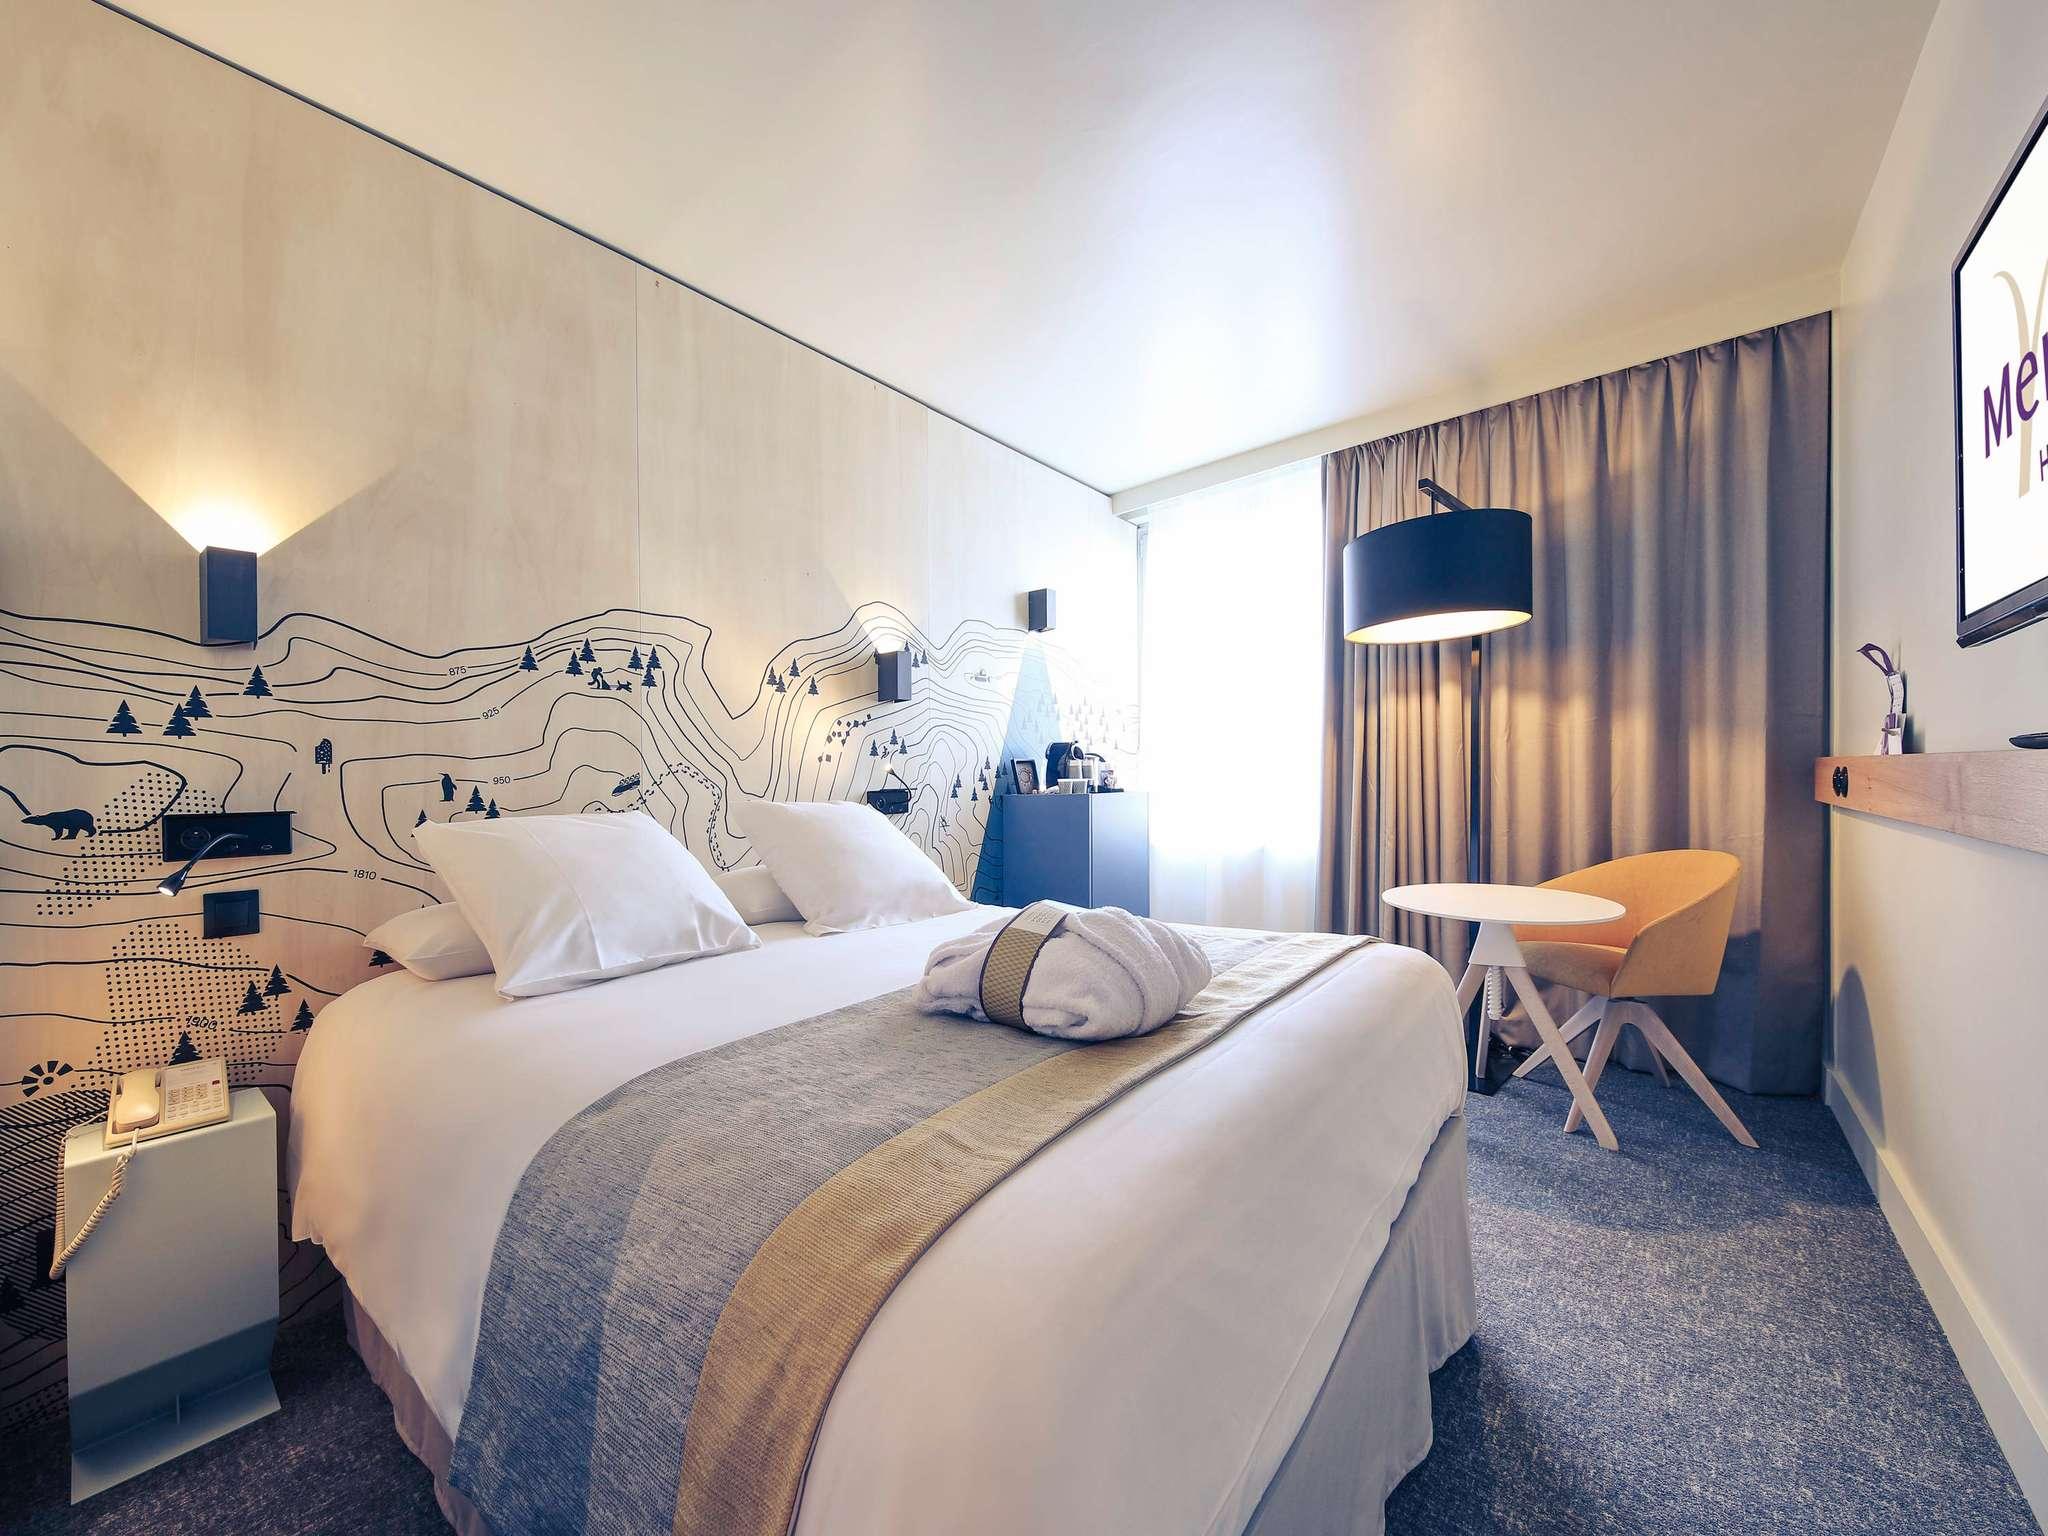 Otel – Hôtel Mercure Grenoble Centre Alpotel